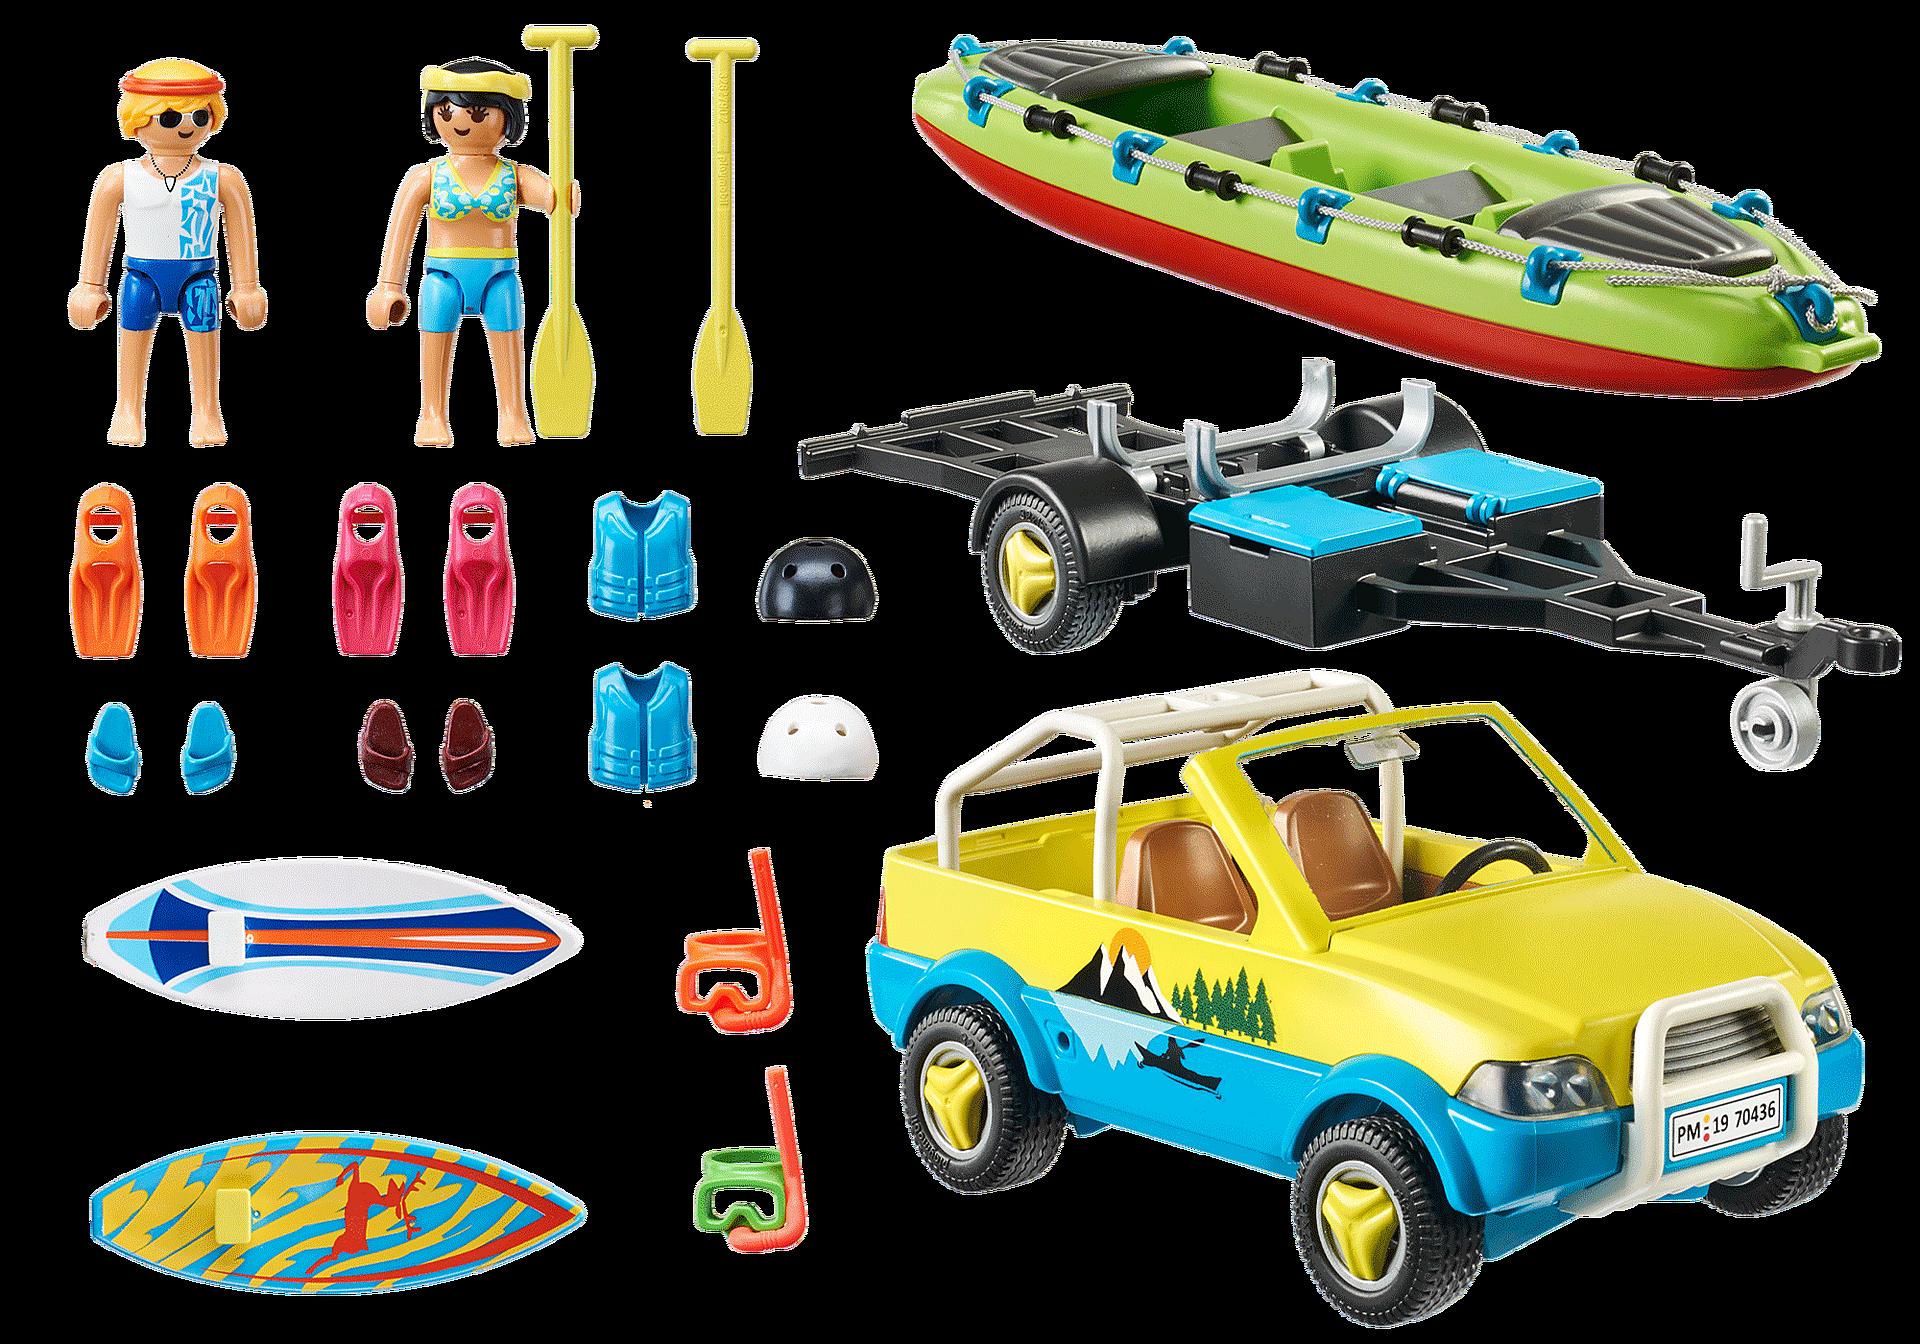 70436 Strandauto mit Kanuanhänger zoom image4